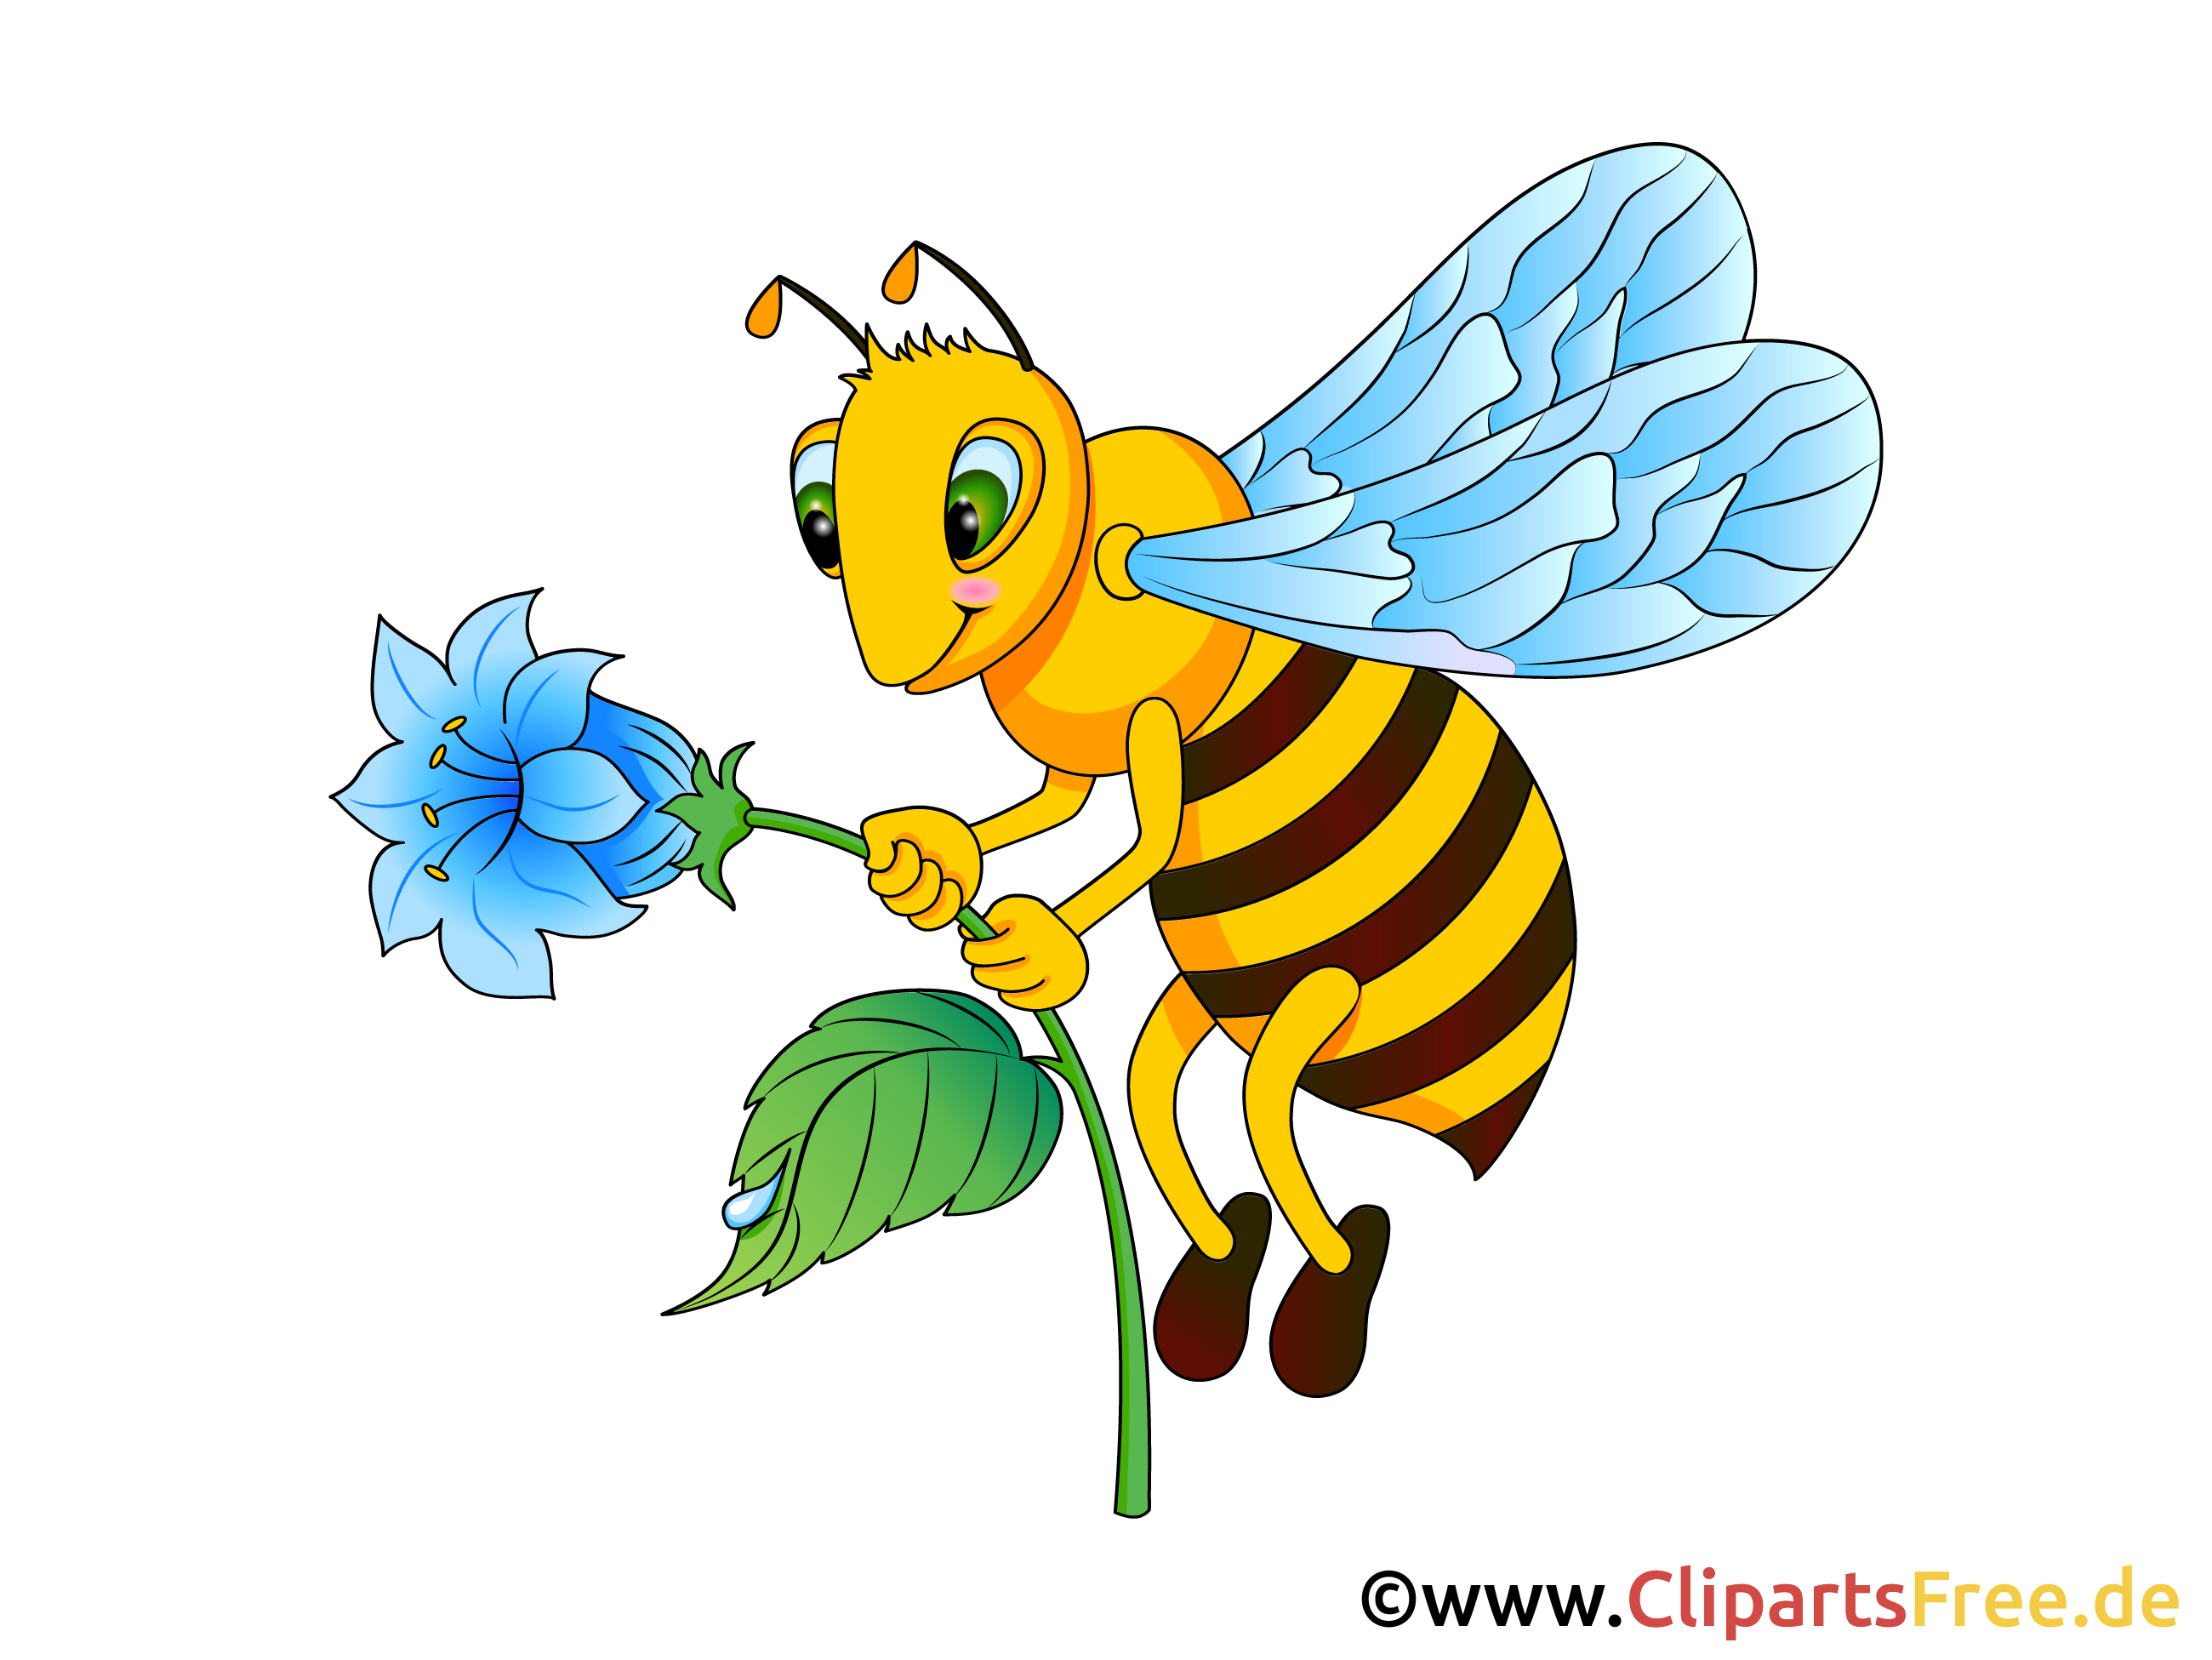 Biene Bild, Clip Art, Illustration, Grafik gratis